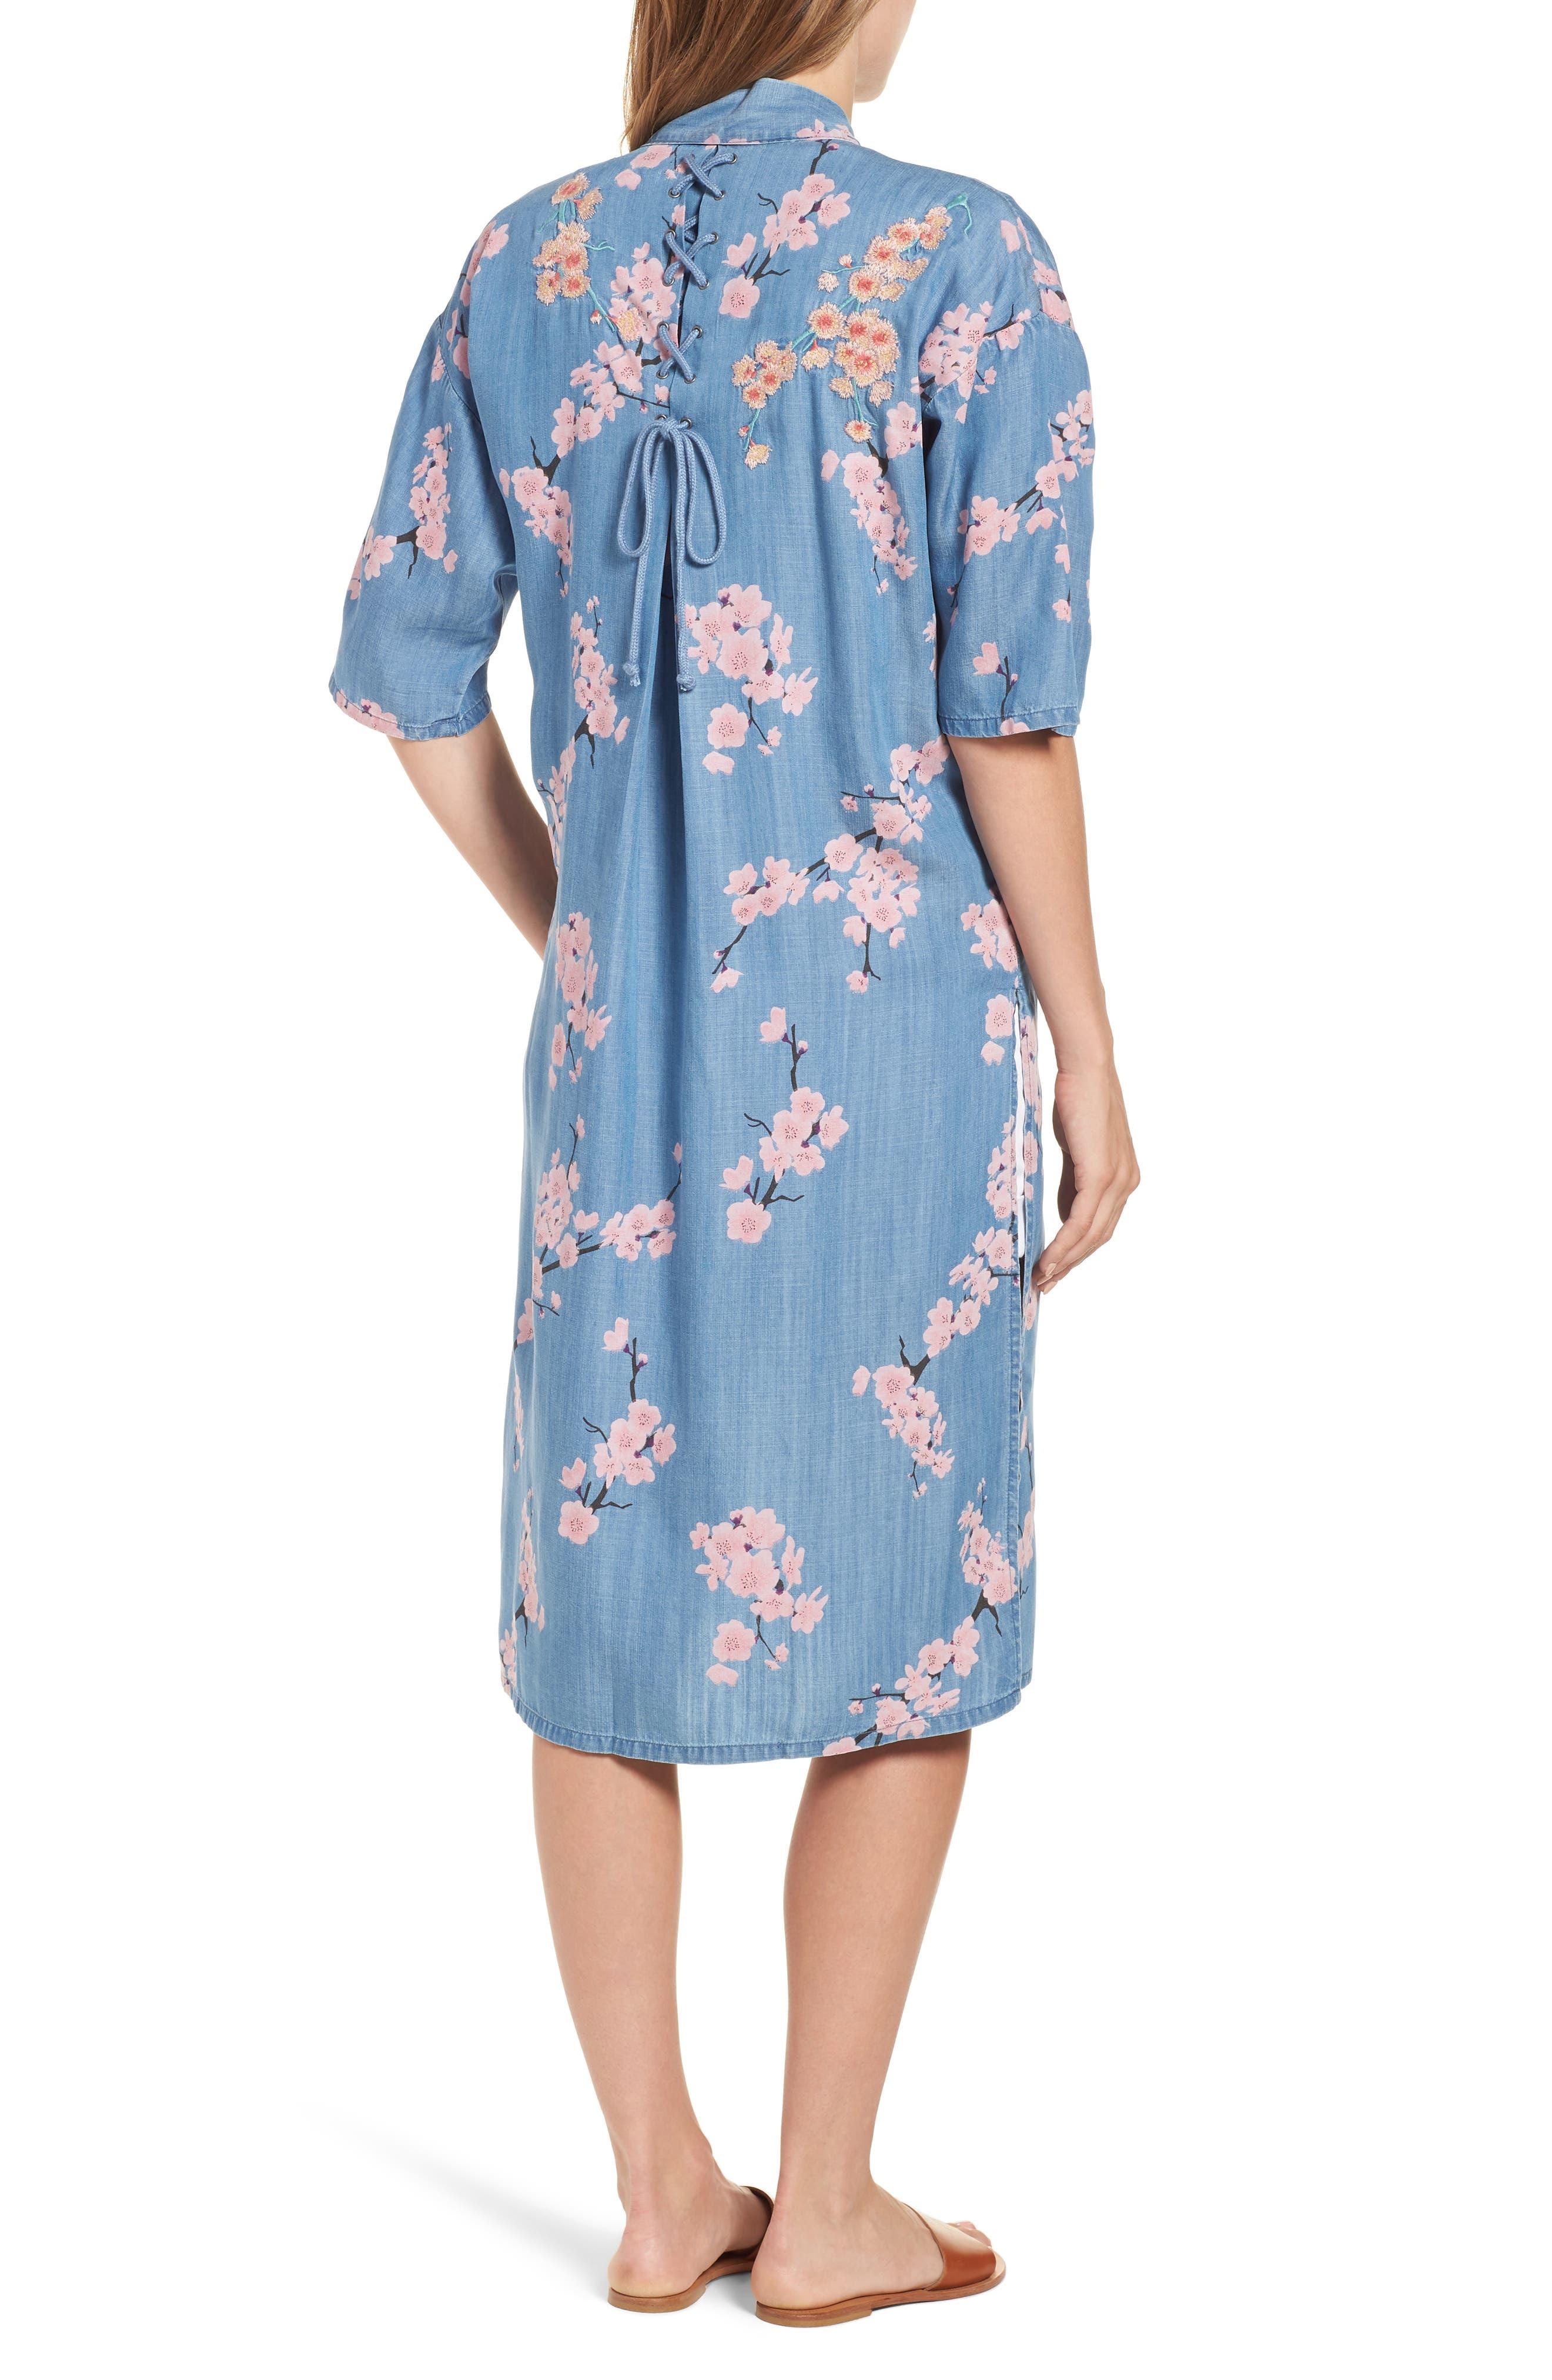 Cherry Blossom Kimono,                             Alternate thumbnail 2, color,                             Blue Cherry Blossom